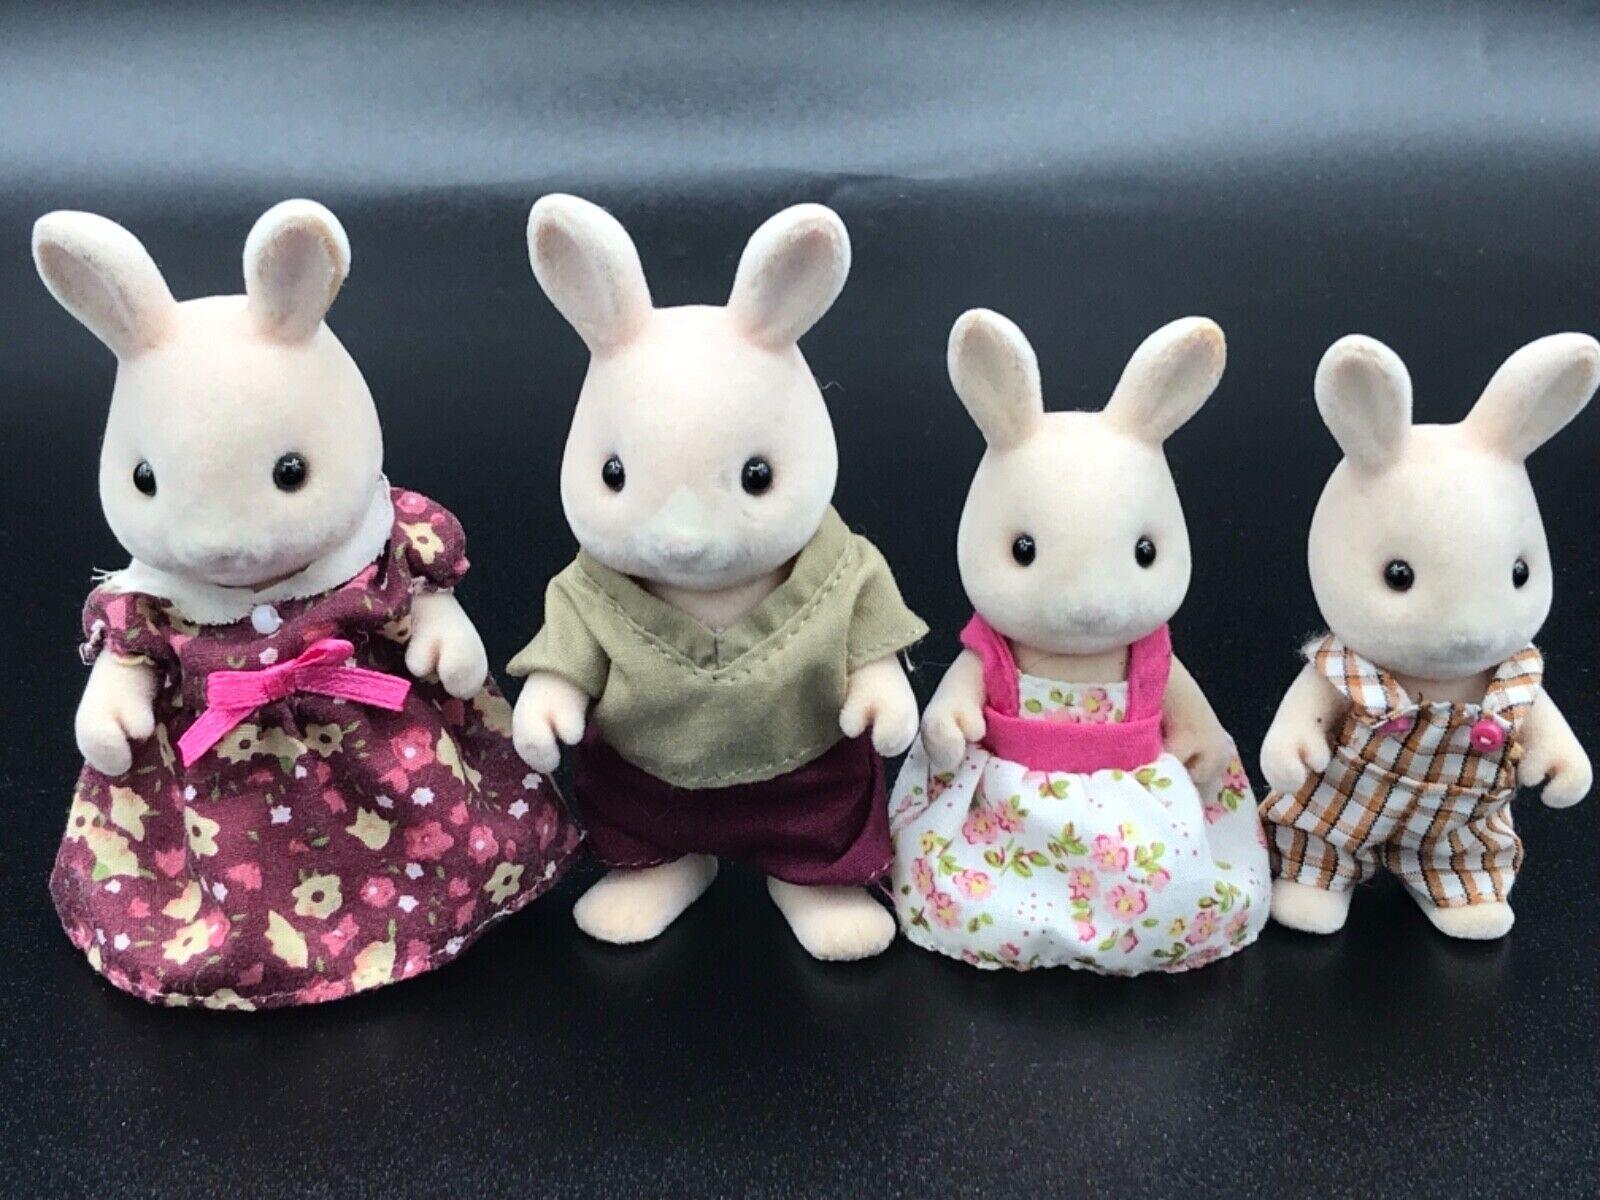 Calico Critters Sylvanian Families Champagne Hopkins RARE Rabbit Family